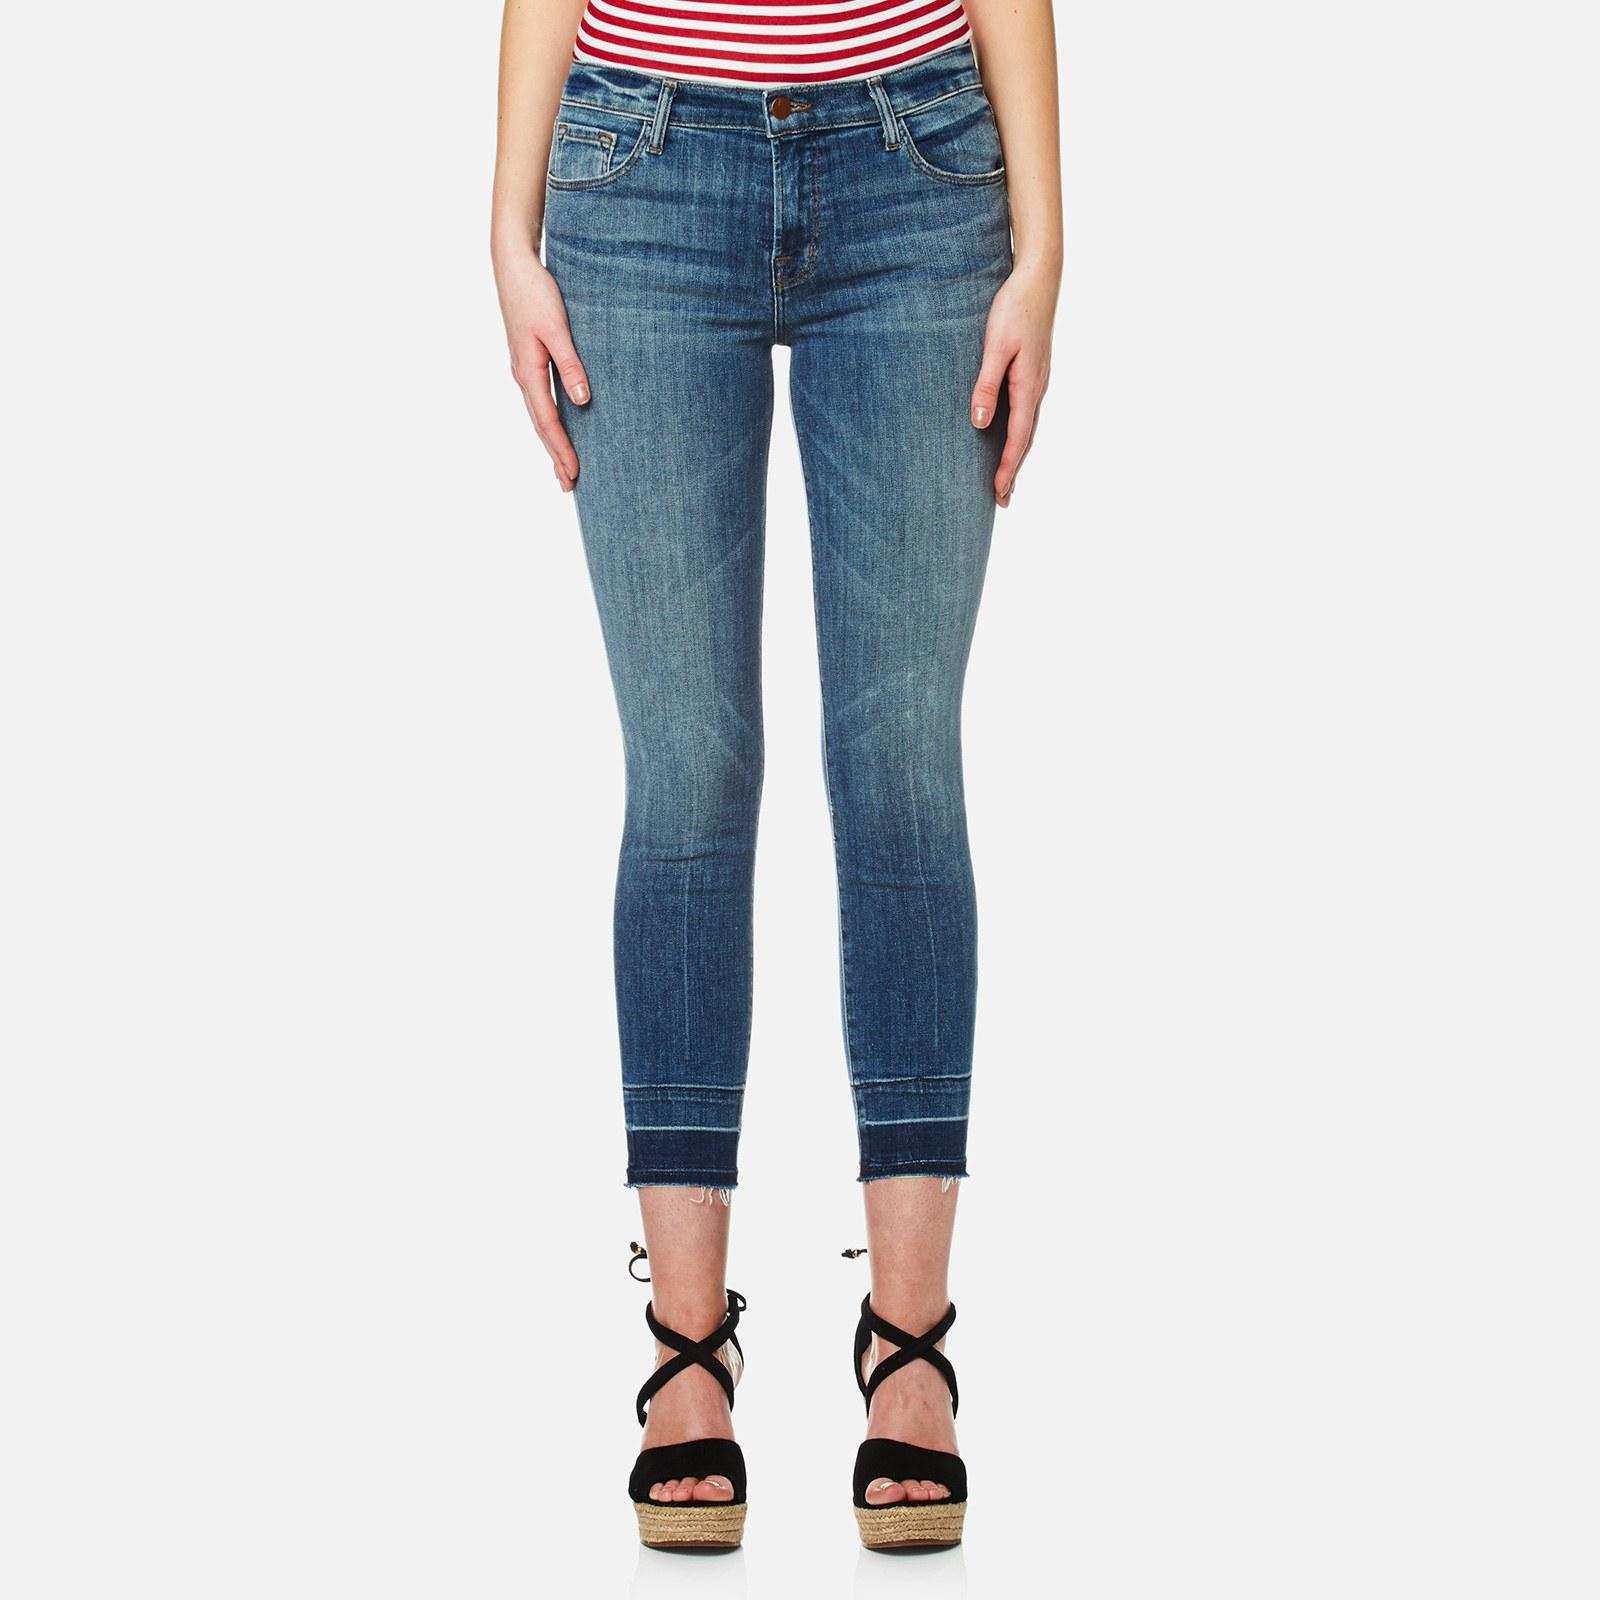 J Brand Women s 835 Mid Rise Crop Skinny Jeans - Corrupted 09ba26816b3f2